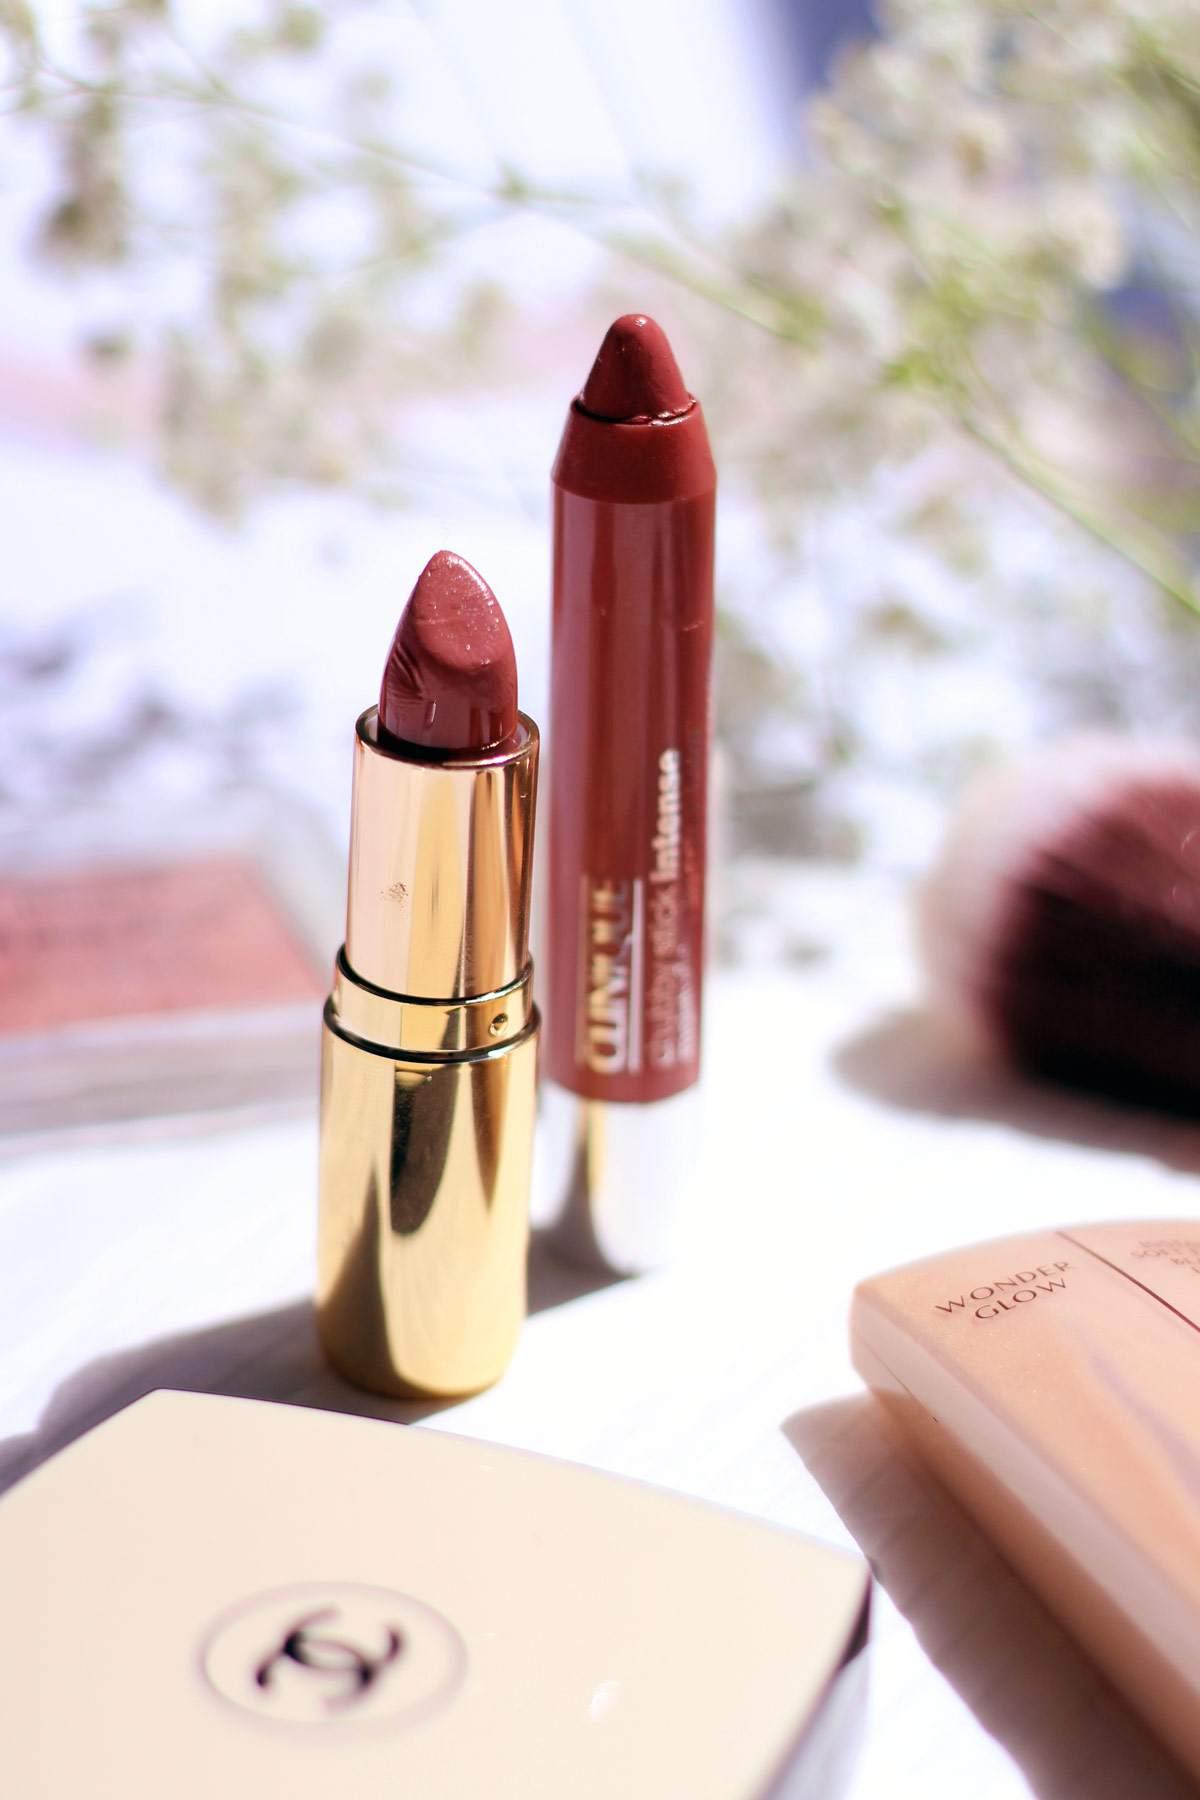 pretty-makeup-H&M-lipstick-chanel-les-beige-charlotte-tilbury-wonderglow-1